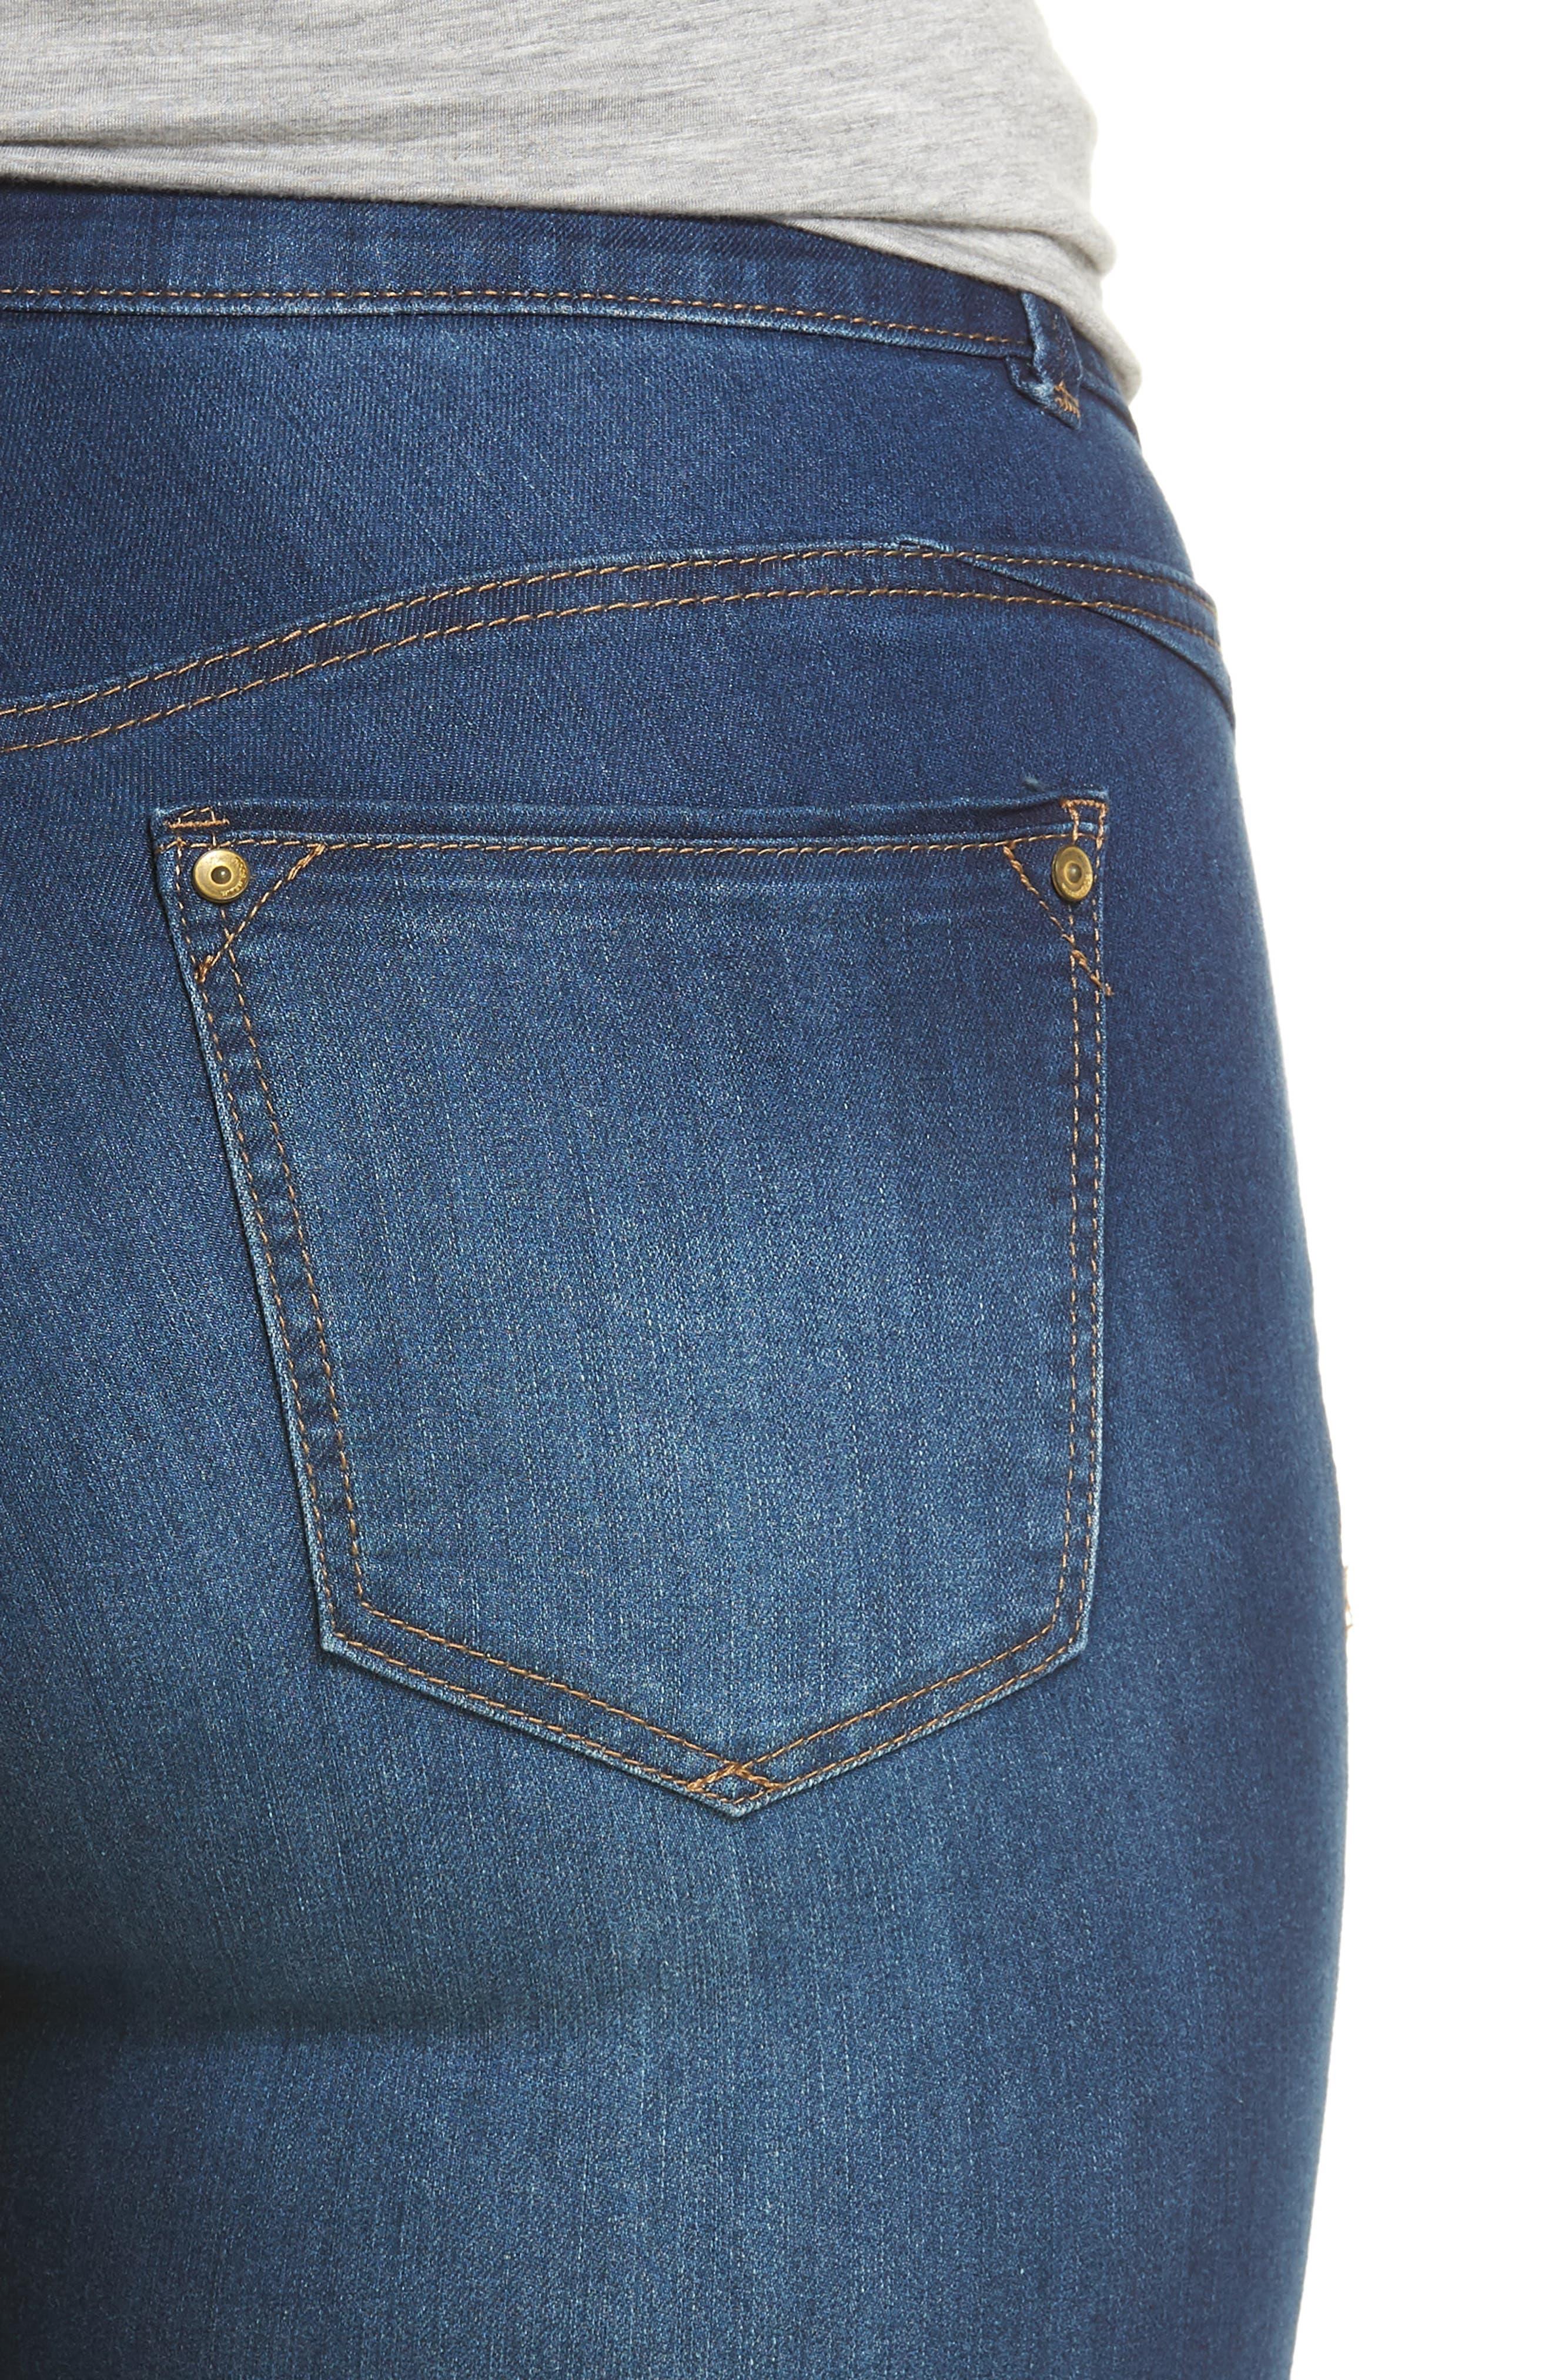 Ab-solution Ankle Skimmer Jeans,                             Alternate thumbnail 4, color,                             Blue